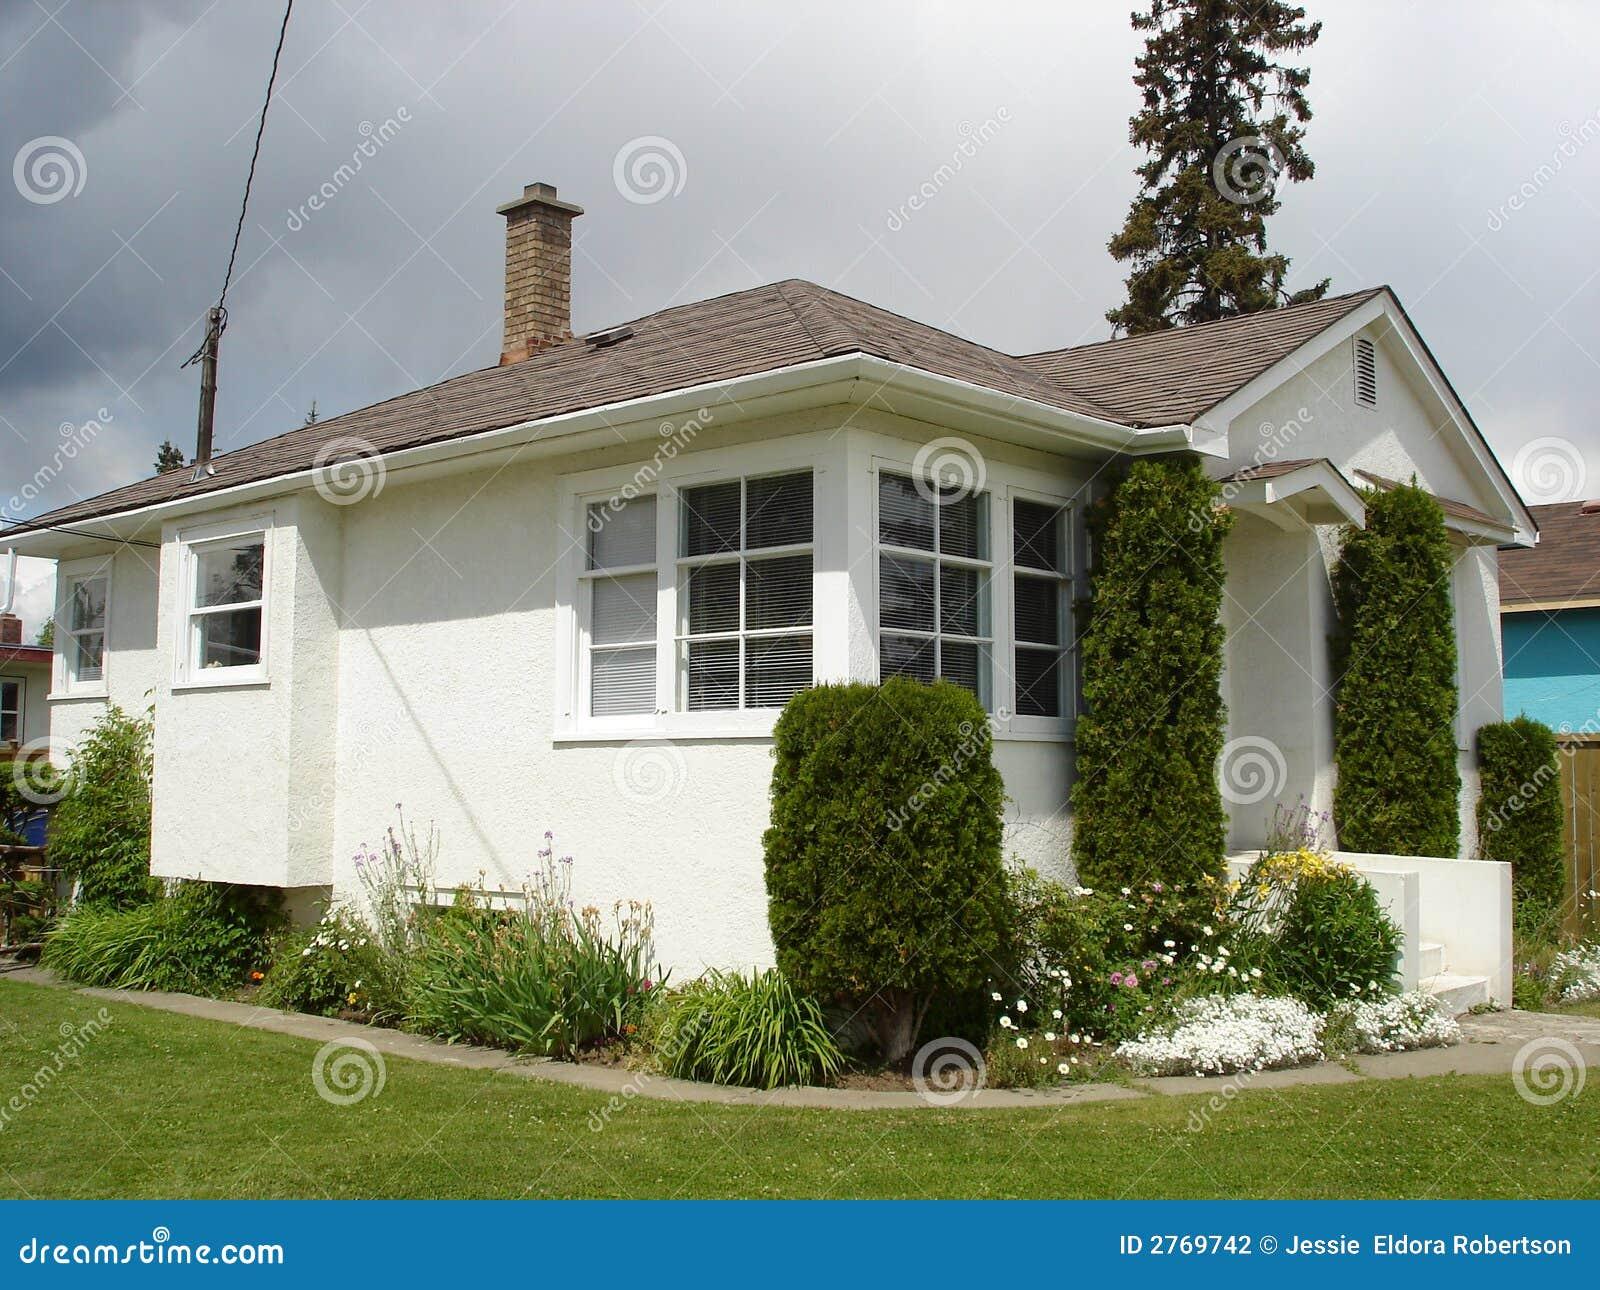 Exterior window trim ideas for stucco - Little White Stucco House White Trimpure Whitepaint Ideasexterior